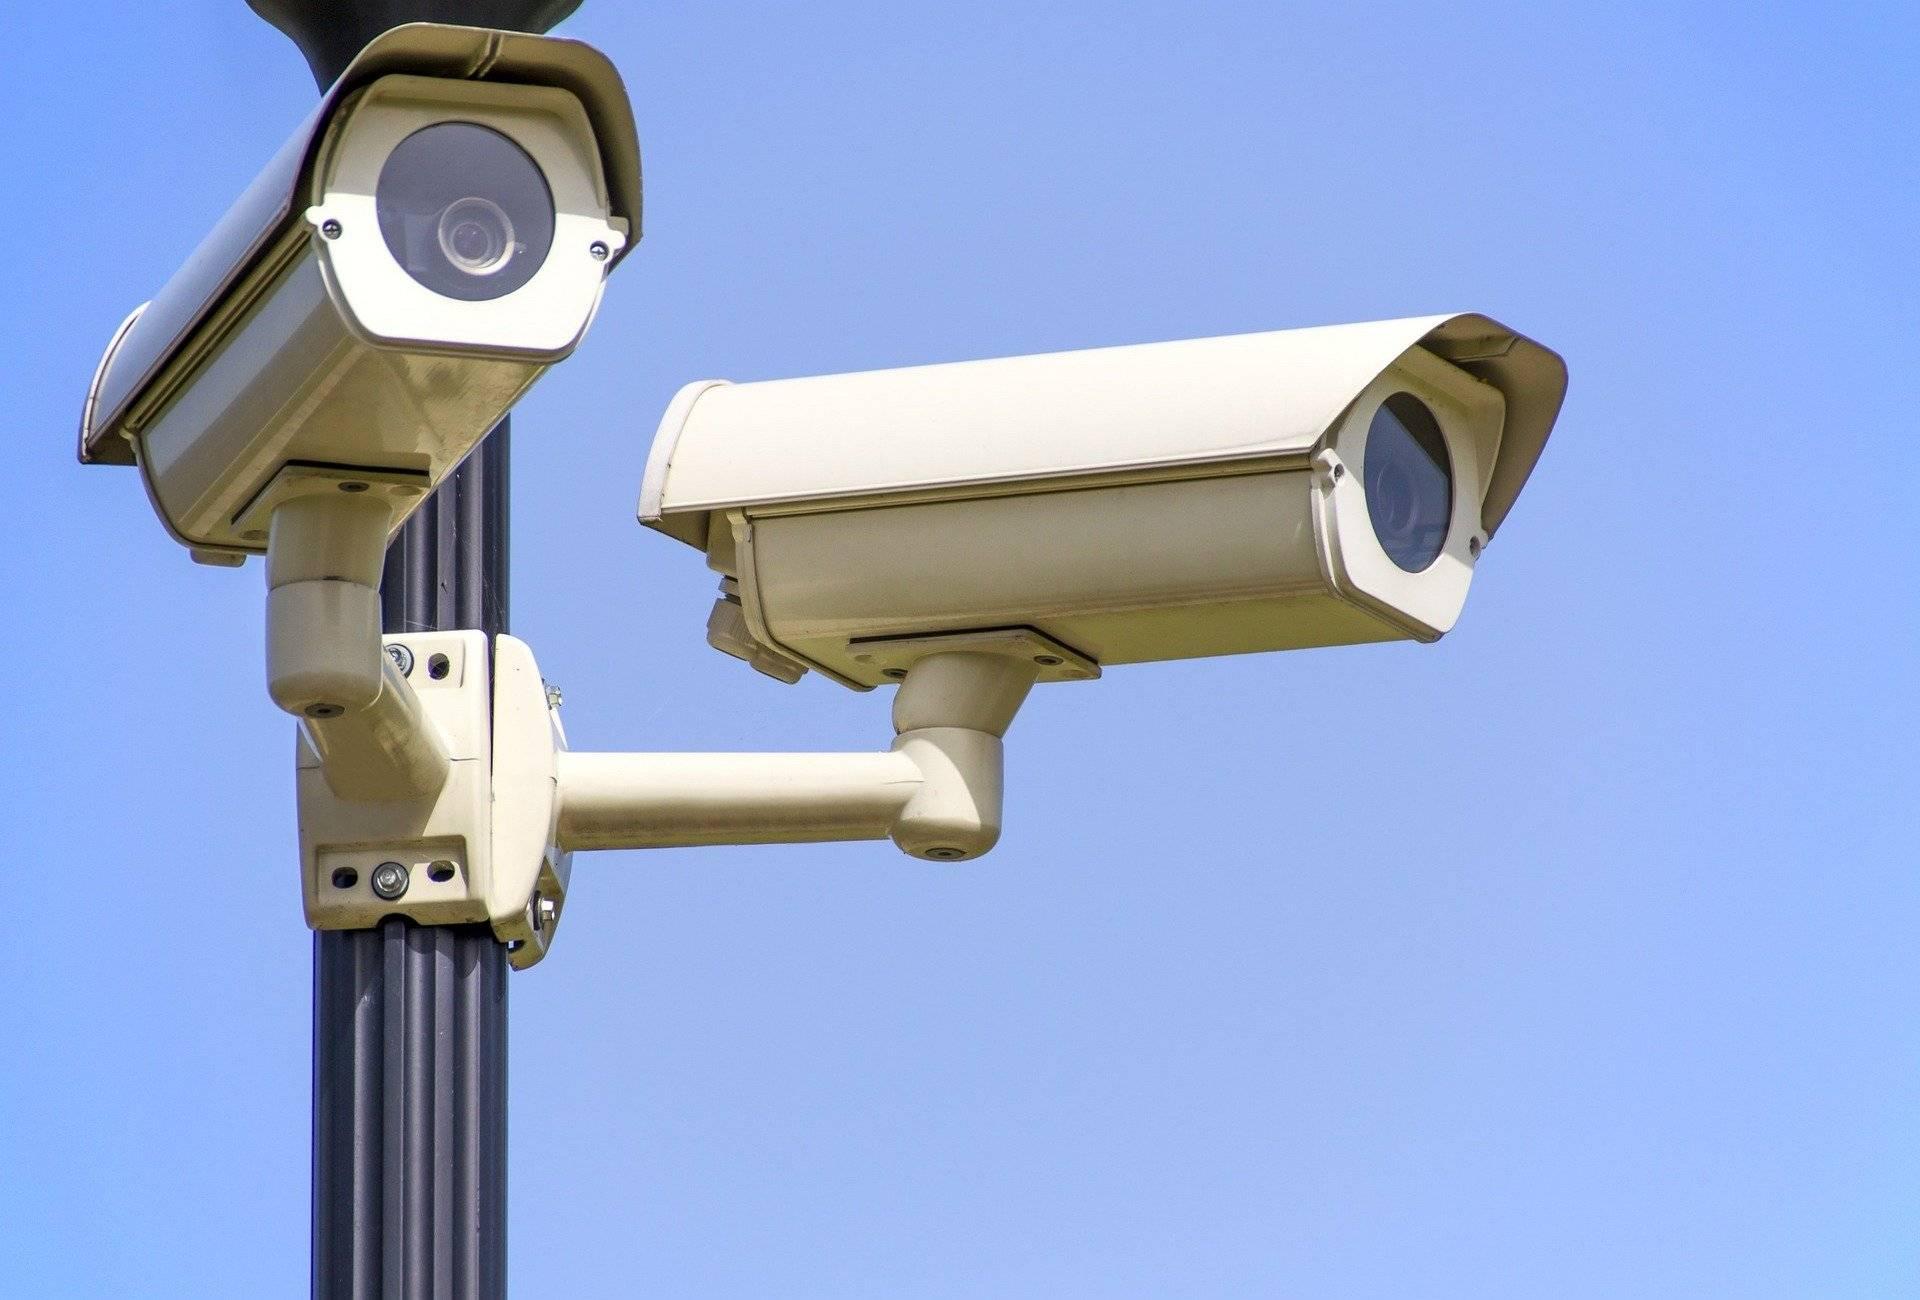 grafika systemy monitoringu kamera na słupie